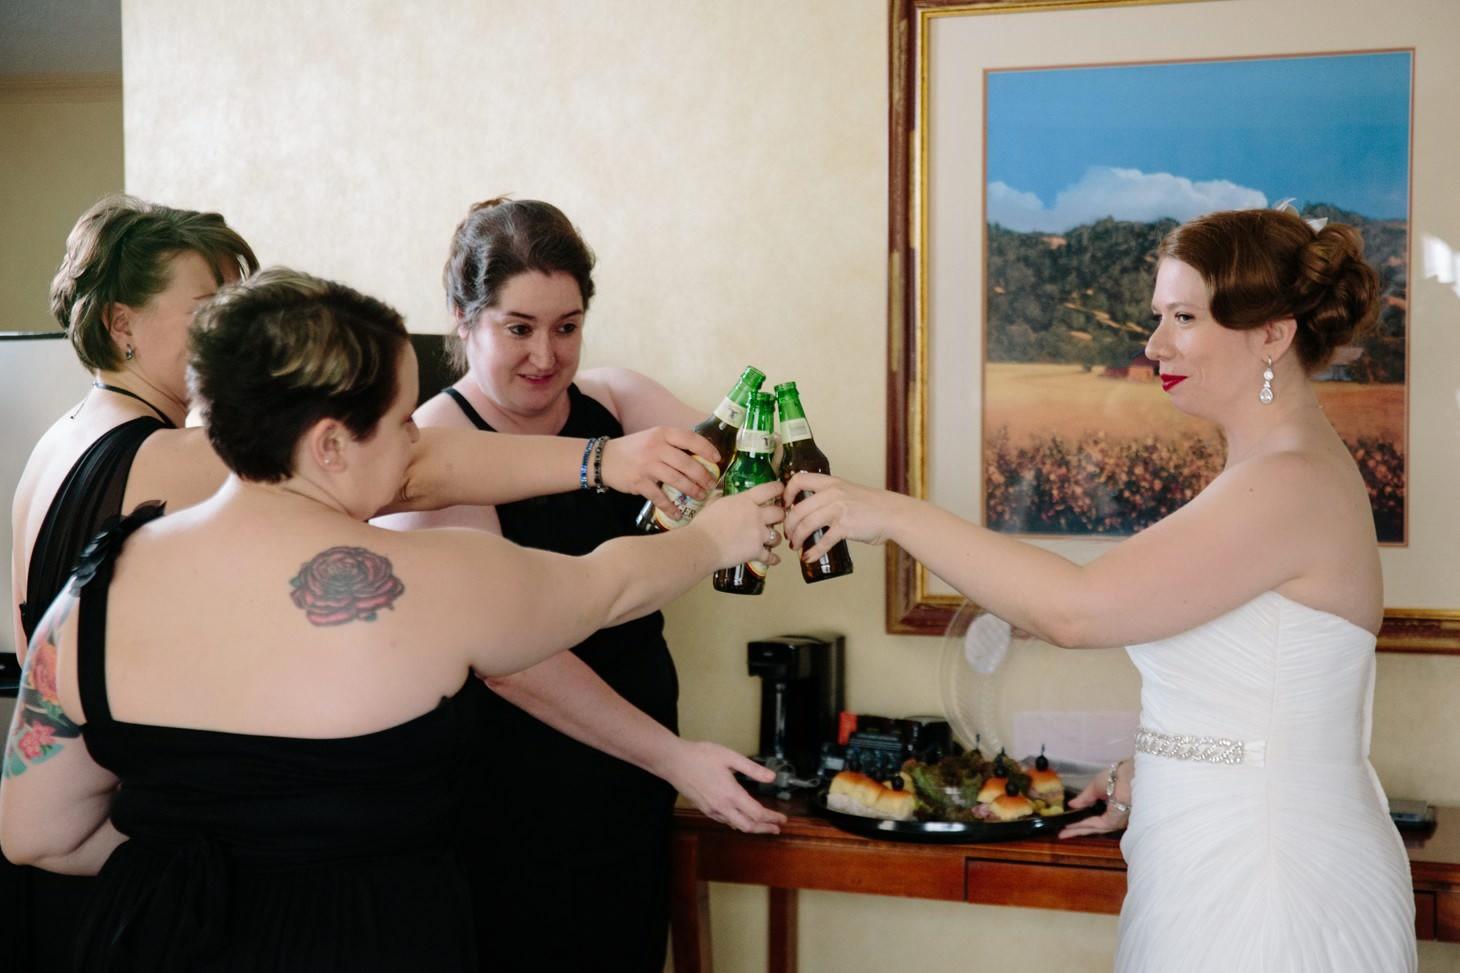 016-nyc-wedding-photographer-nj-nerdy-dr-who-firehouse-wedding-smitten-chickens.jpg